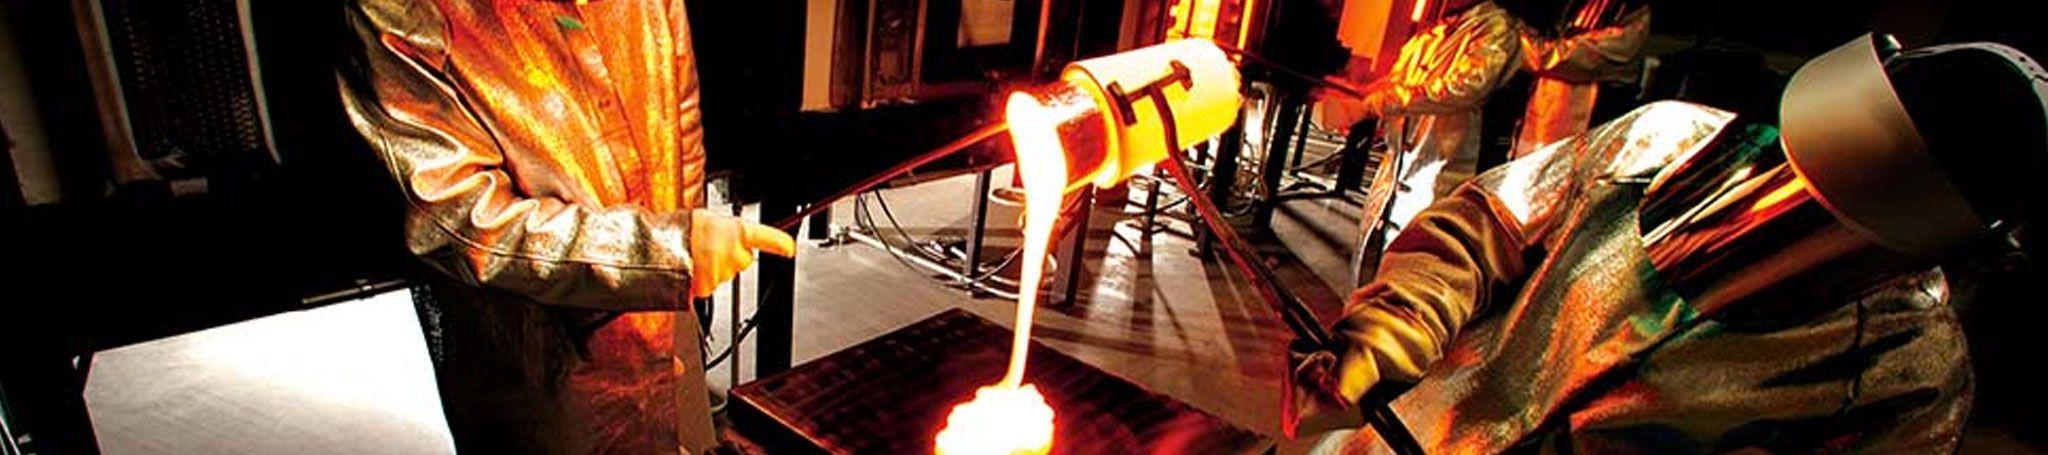 Glass: The Quintessential Nanotech Material | The Glass Age